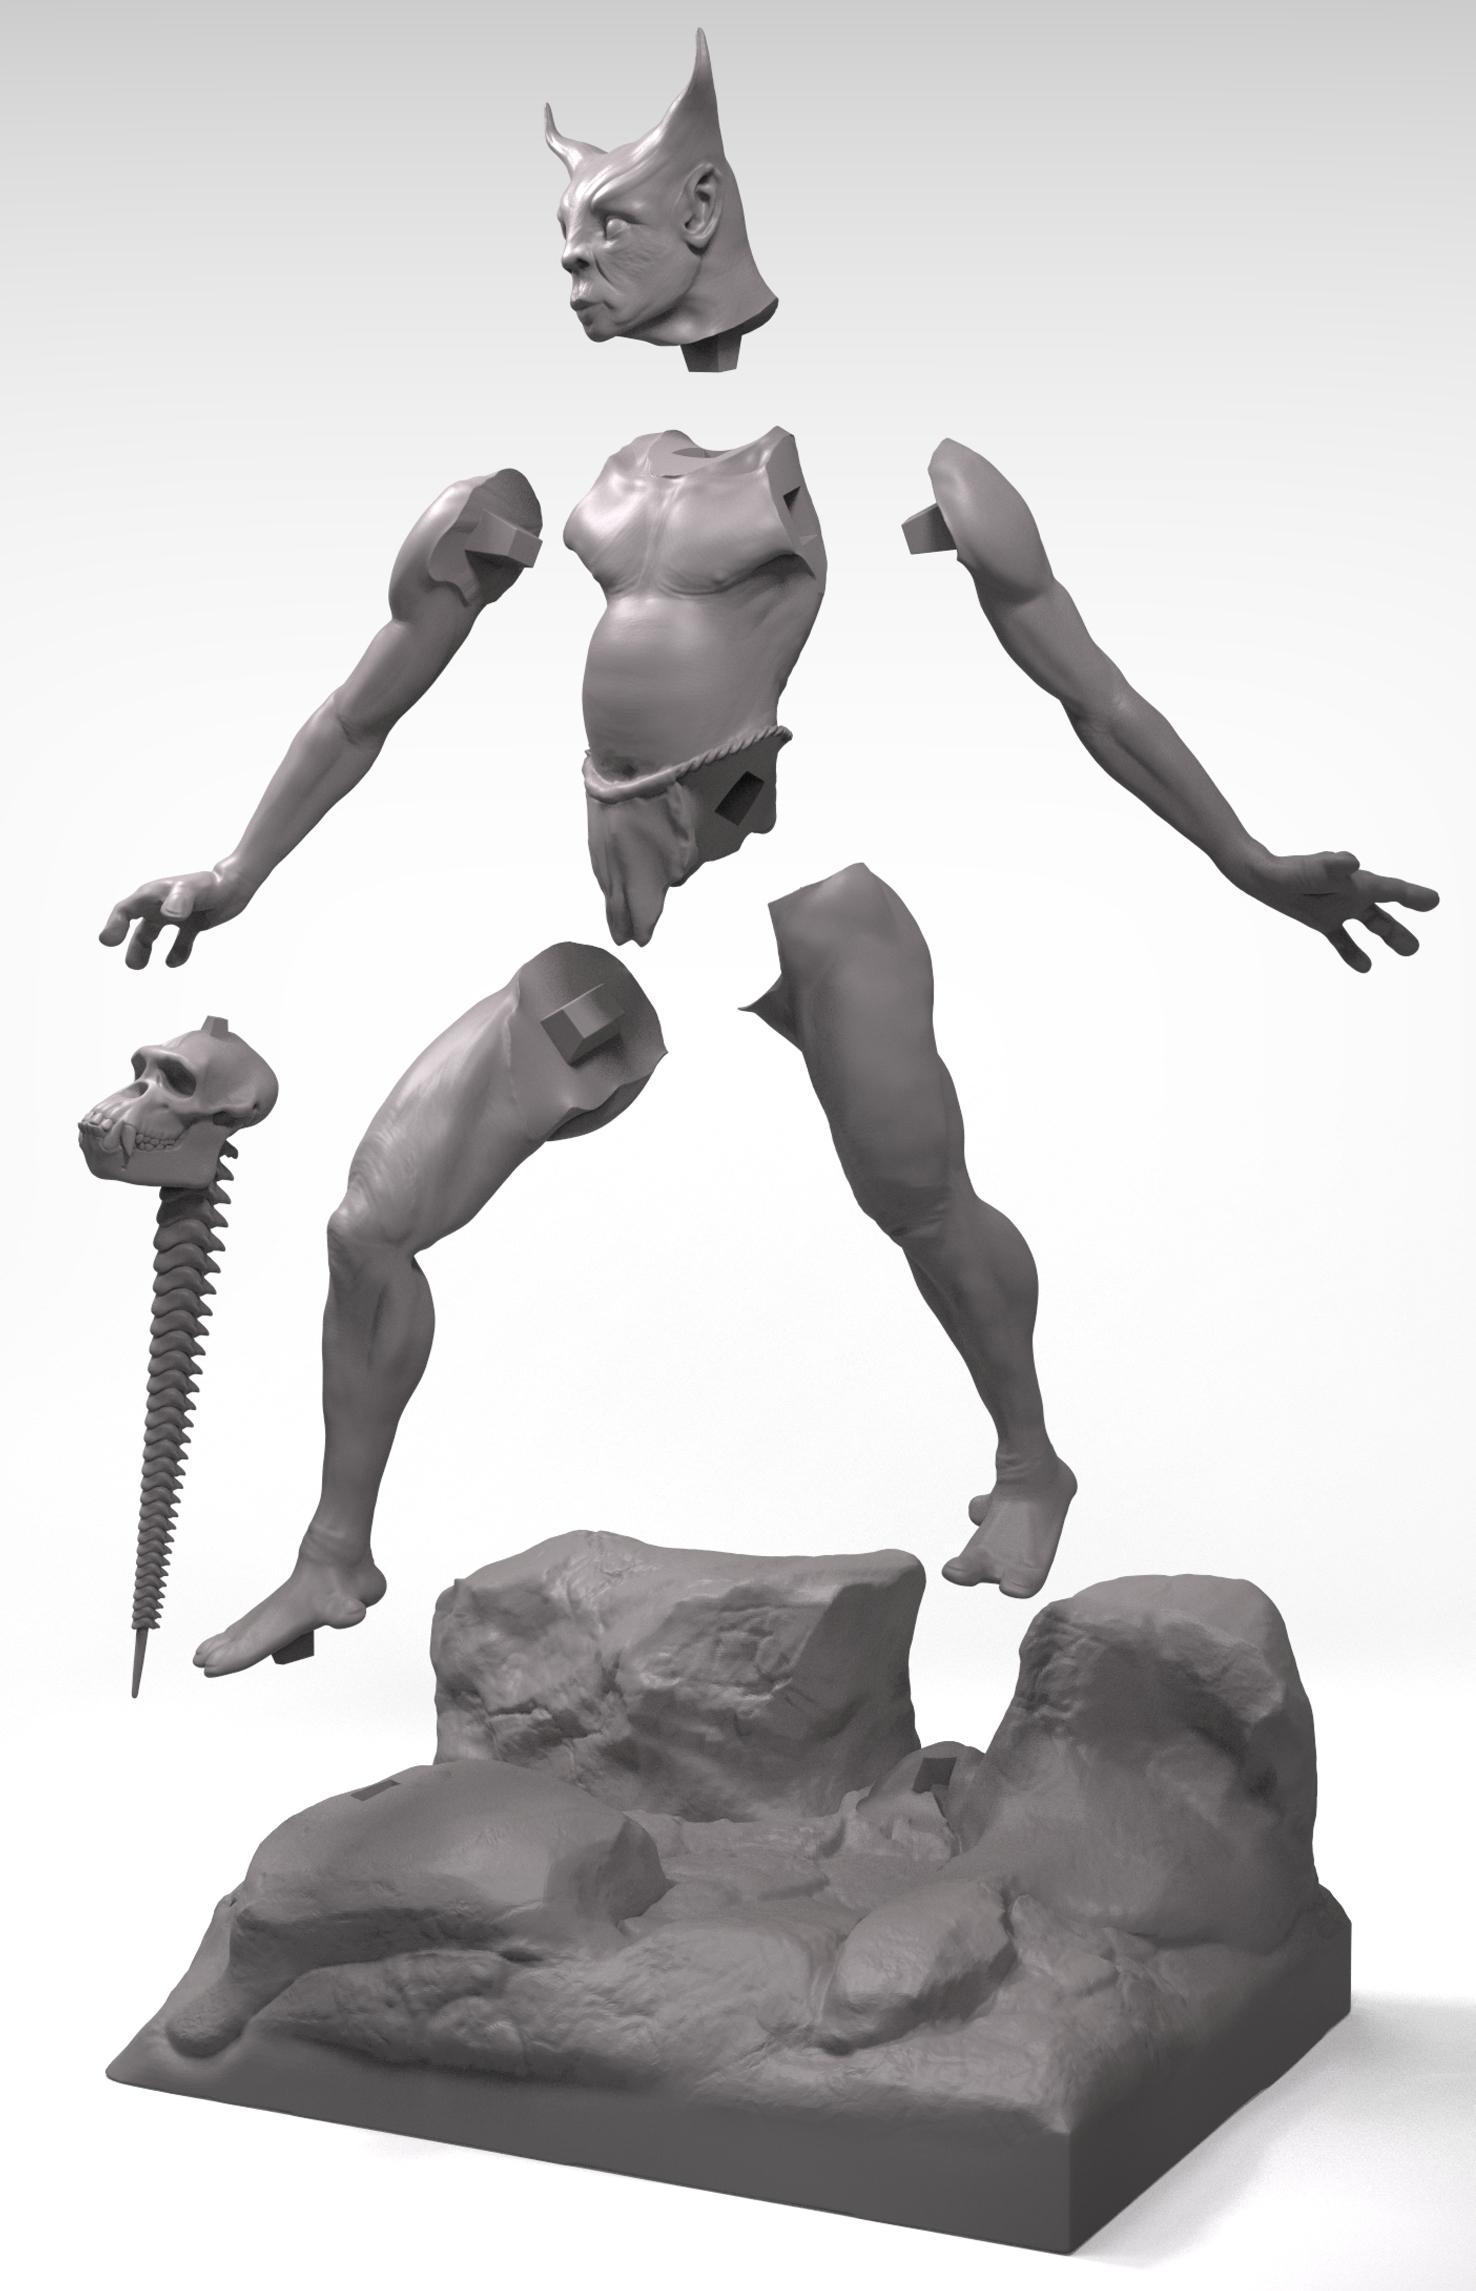 Artistic anatomy and sculpture – 3D Concept Artist & Sculptor